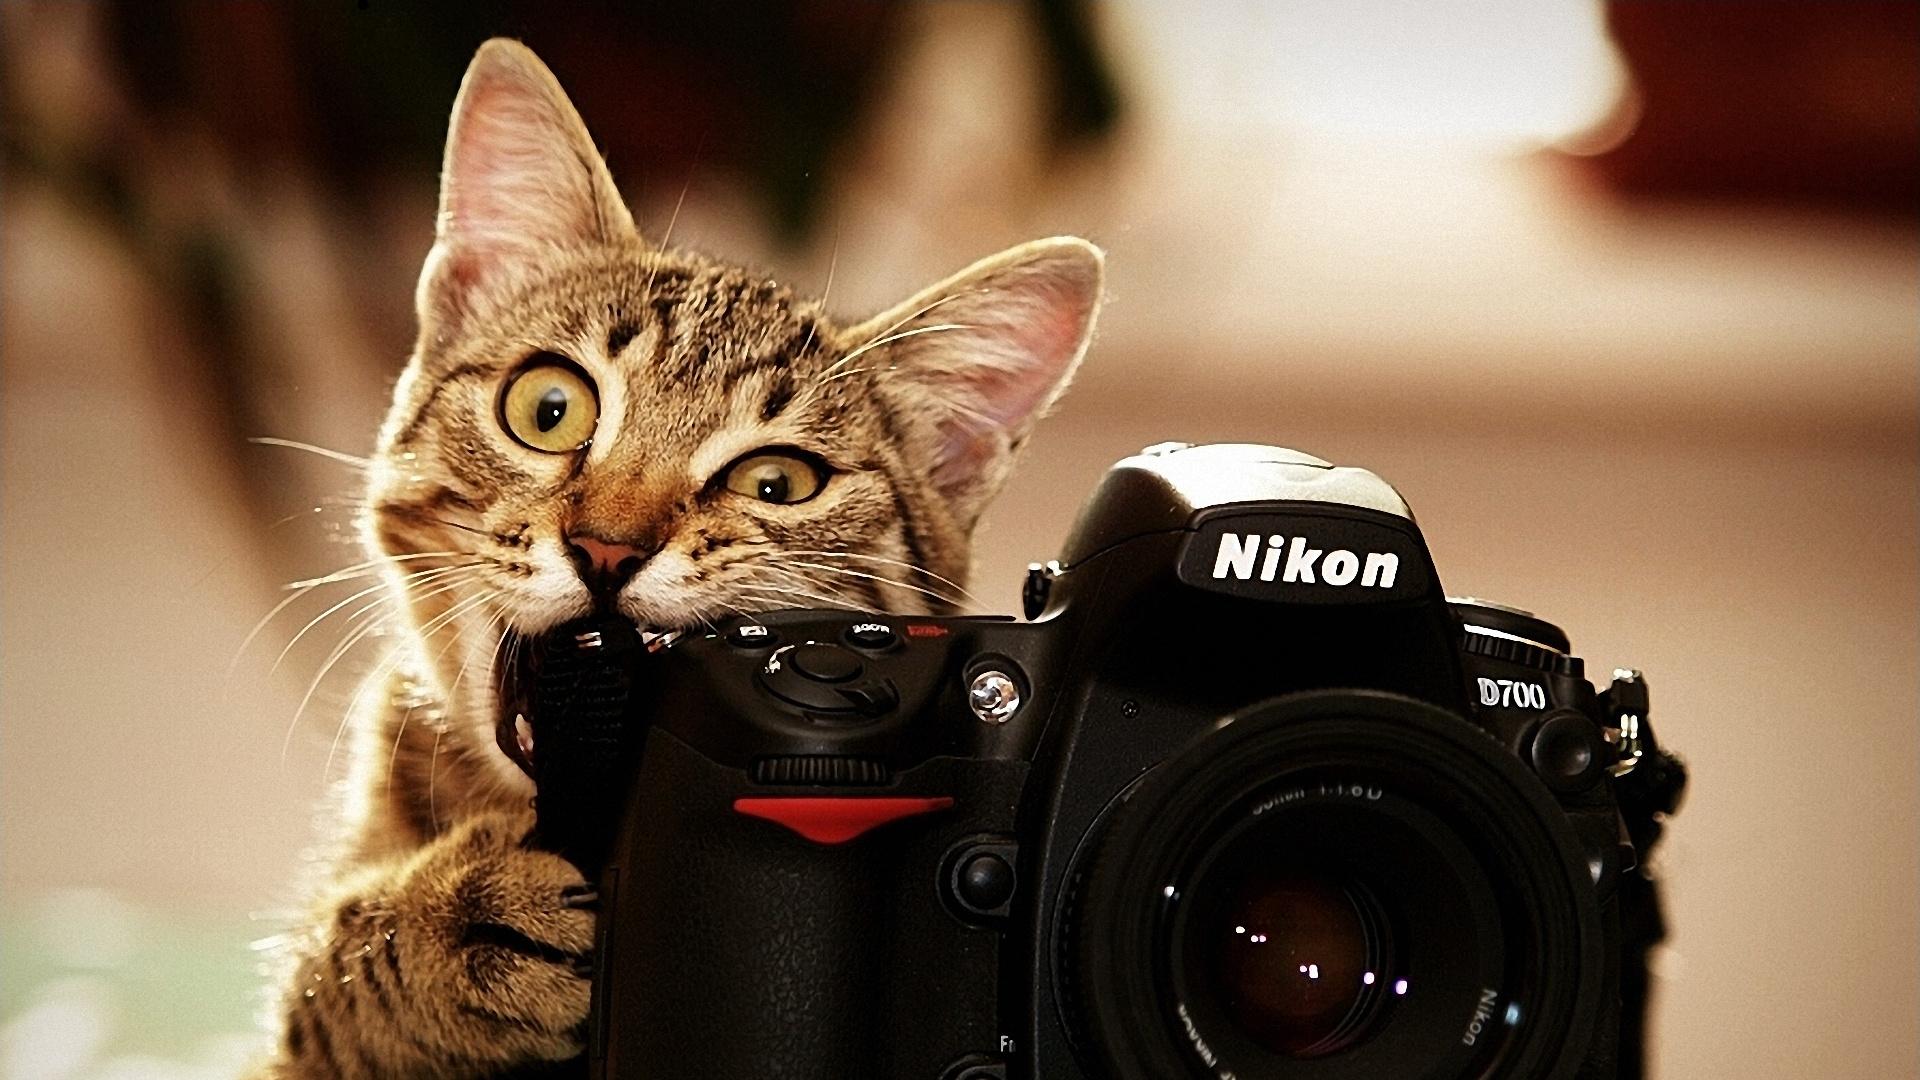 Hd wallpaper camera - Camera Wallpapers